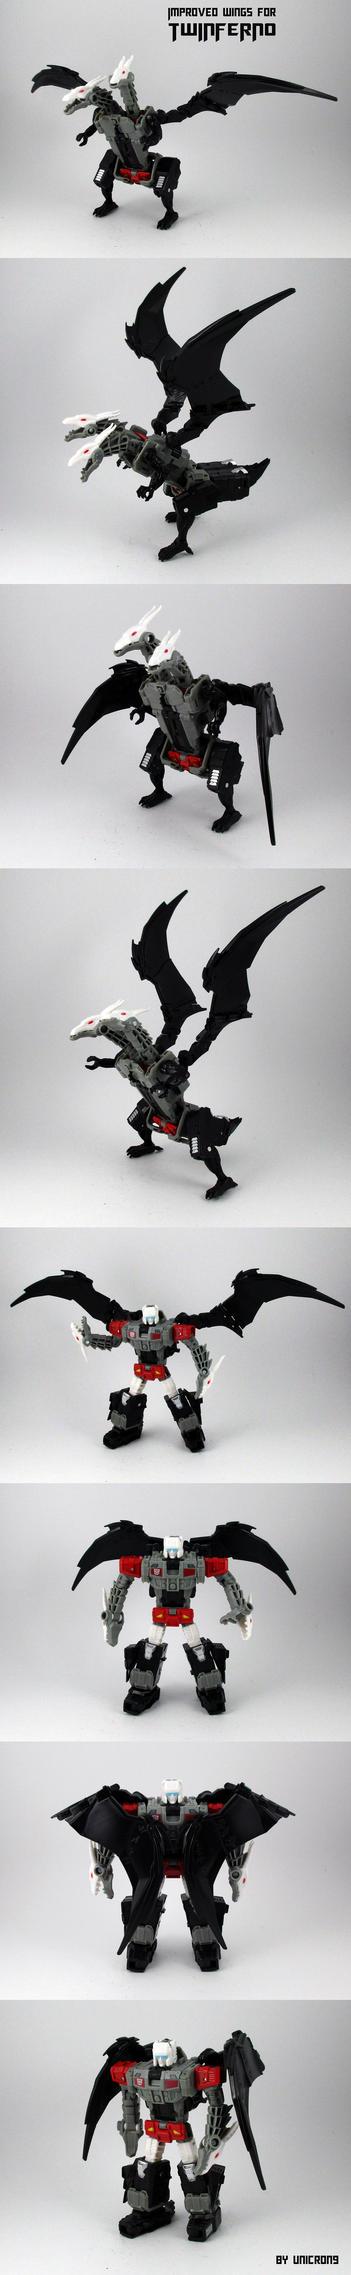 Twinferno Wings by Unicron9